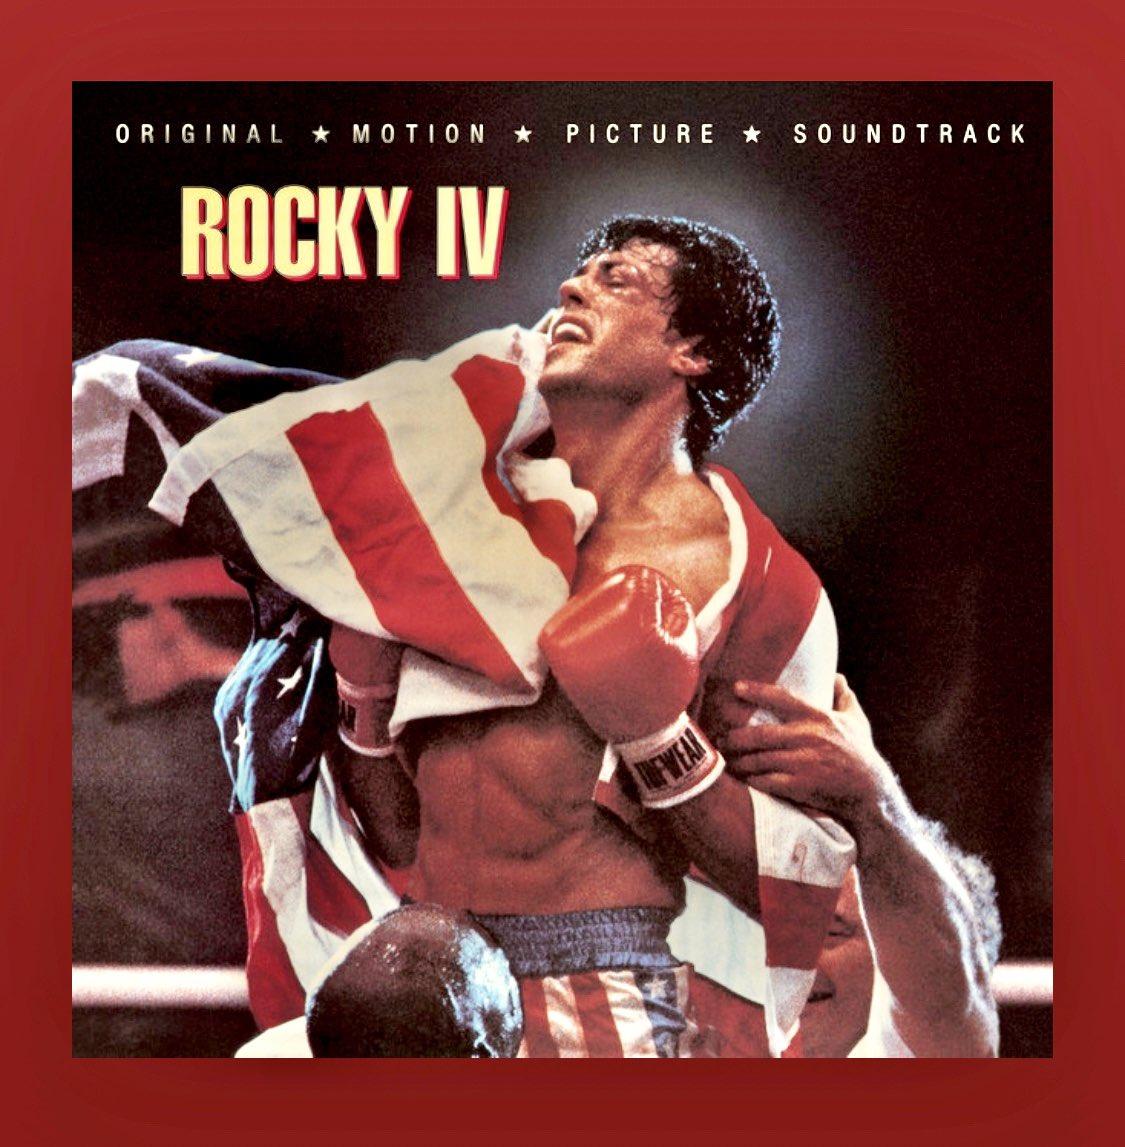 Today's Soundtrack 🇺🇸